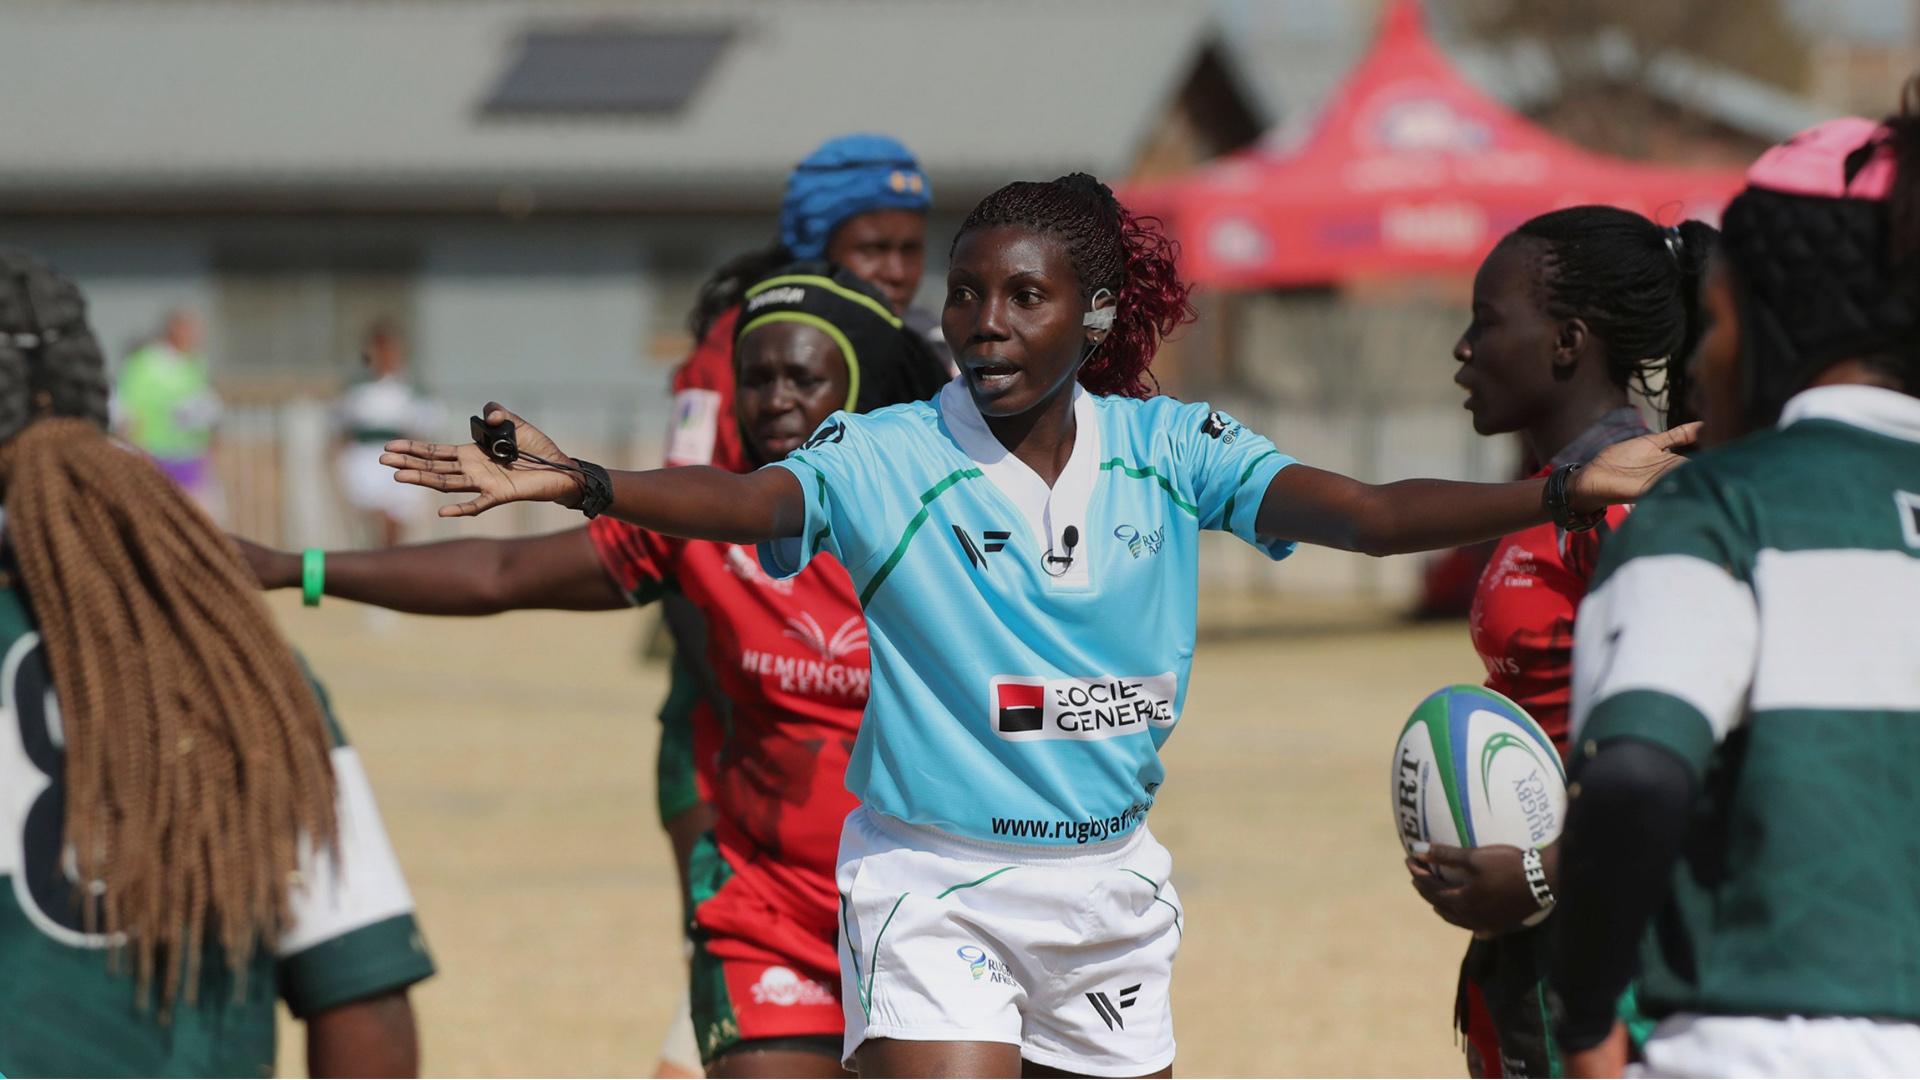 femmes dirigeantes afrique rugby